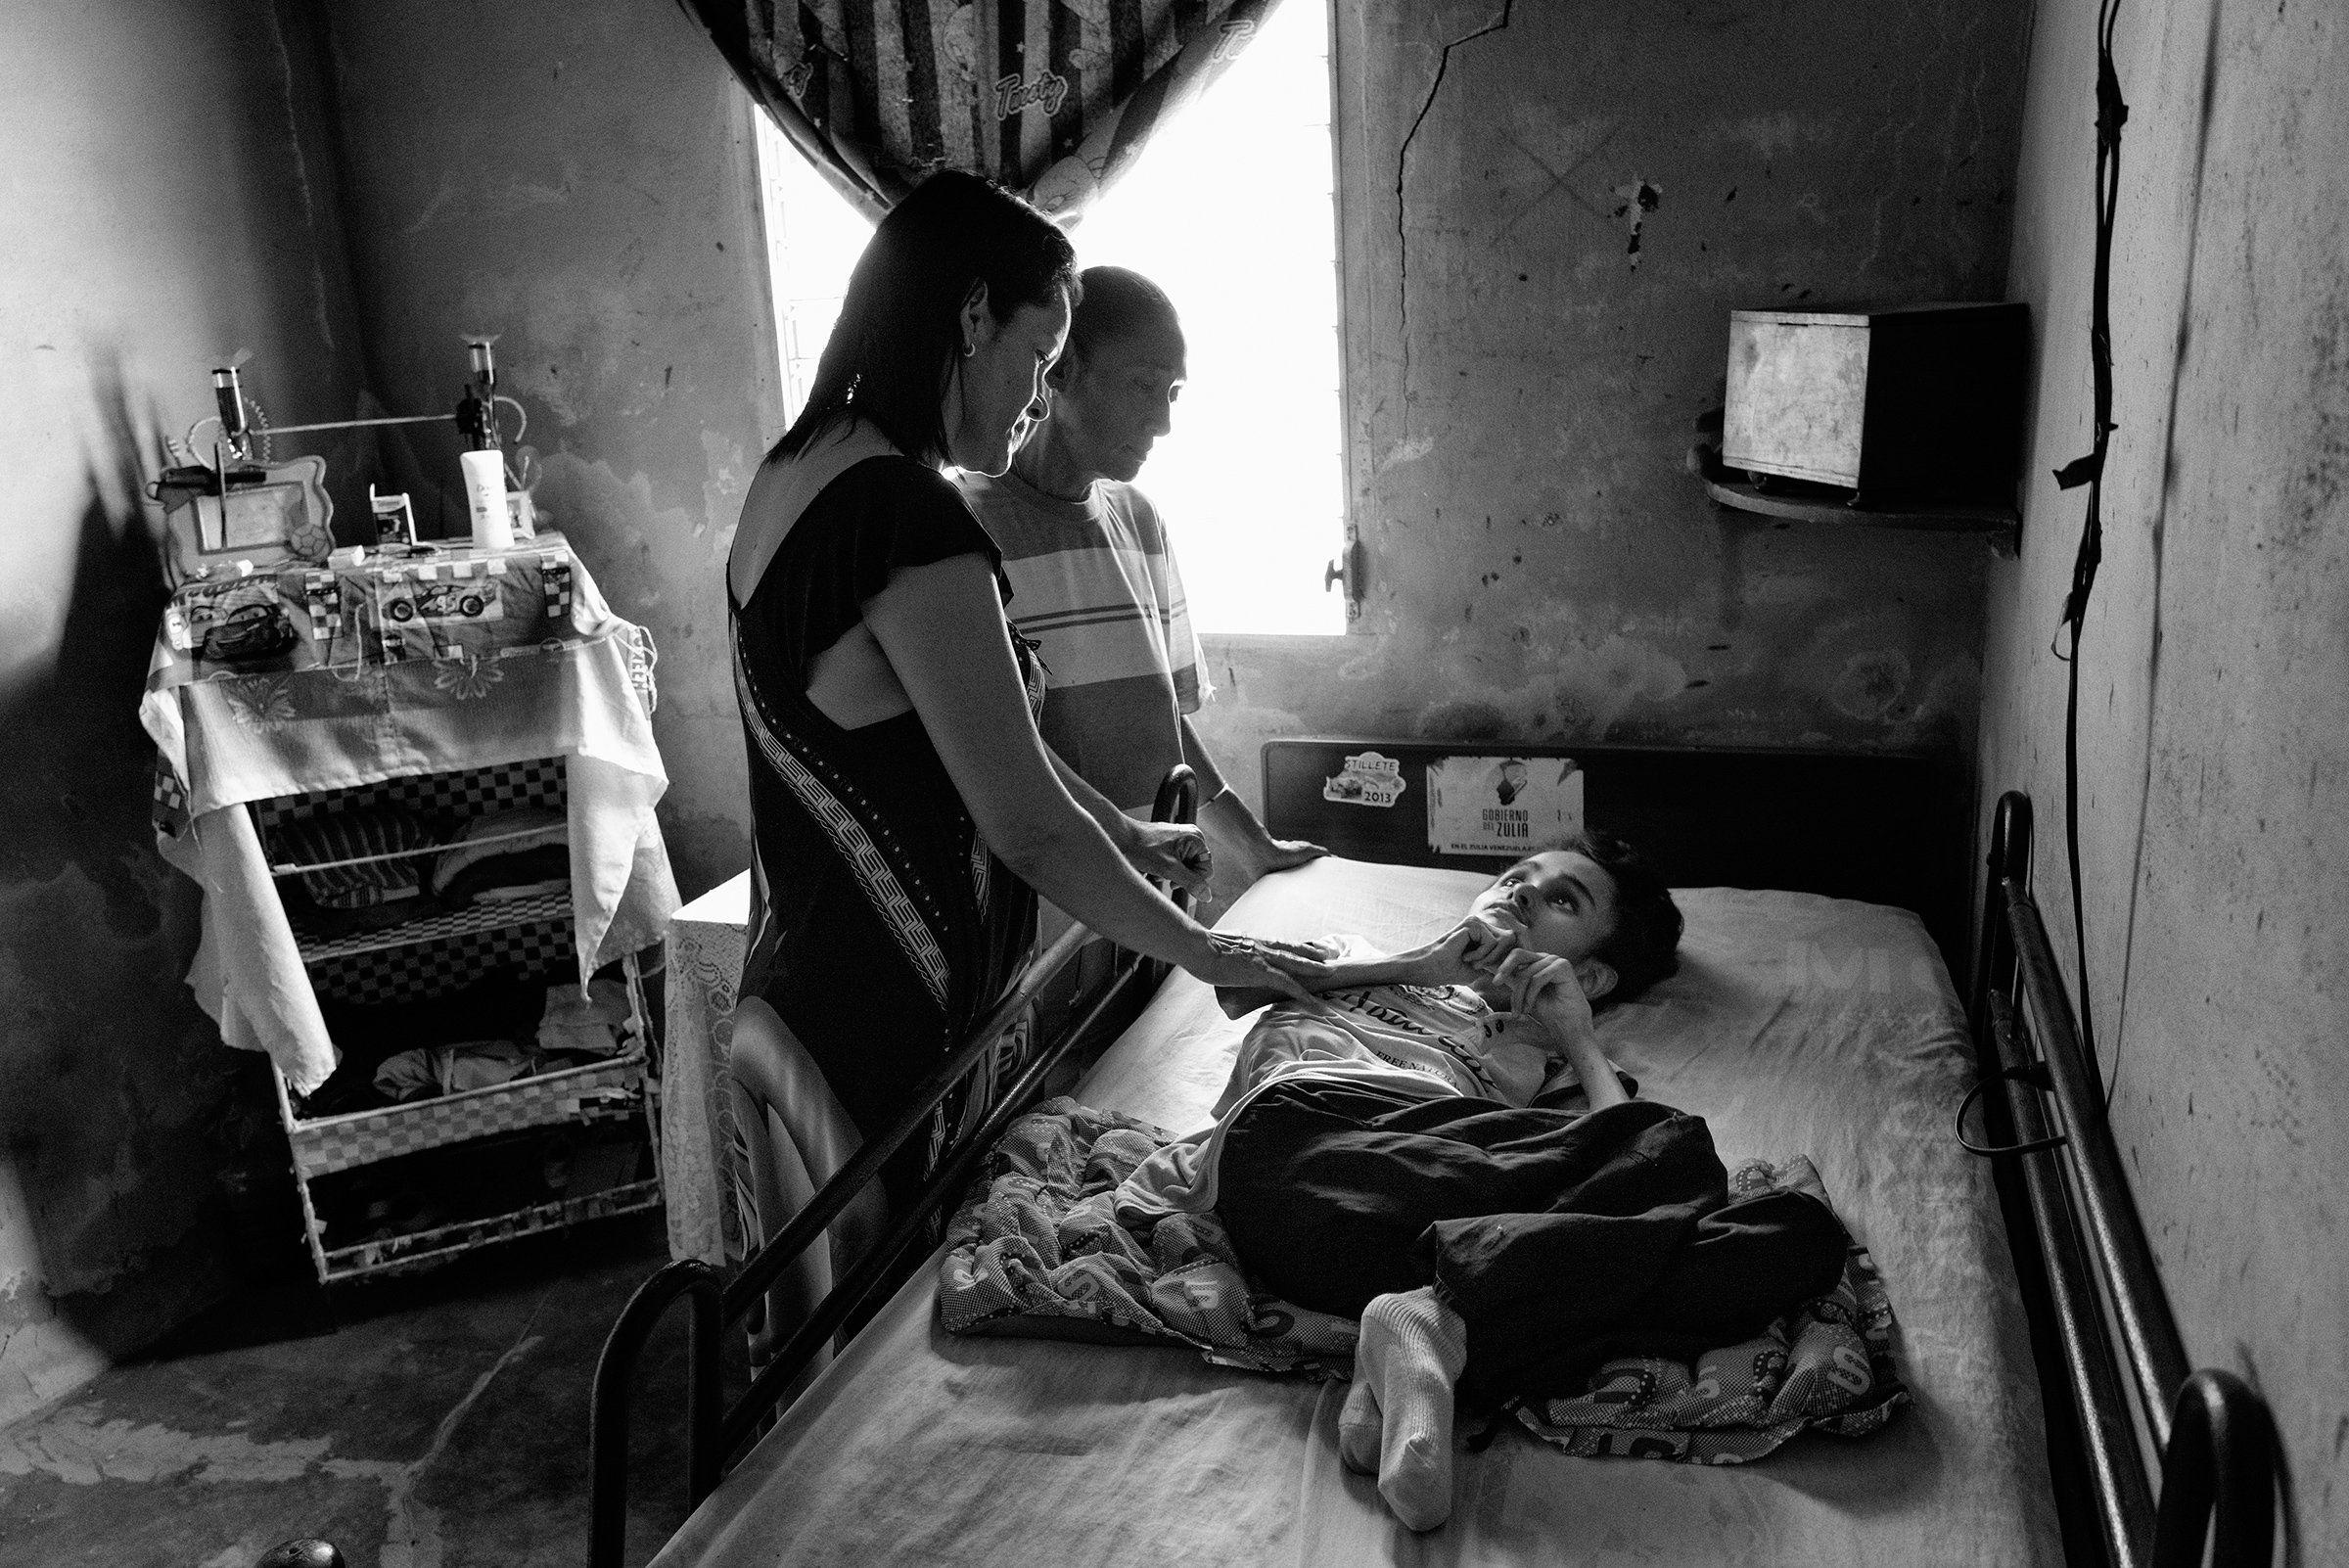 Miguel Blanco, 28, has a neurological condition and suffers from extreme malnutrition. Blanco was photographed in April in El Barrio Alto de Milagros Norte in Maracaibo, Venezuela.